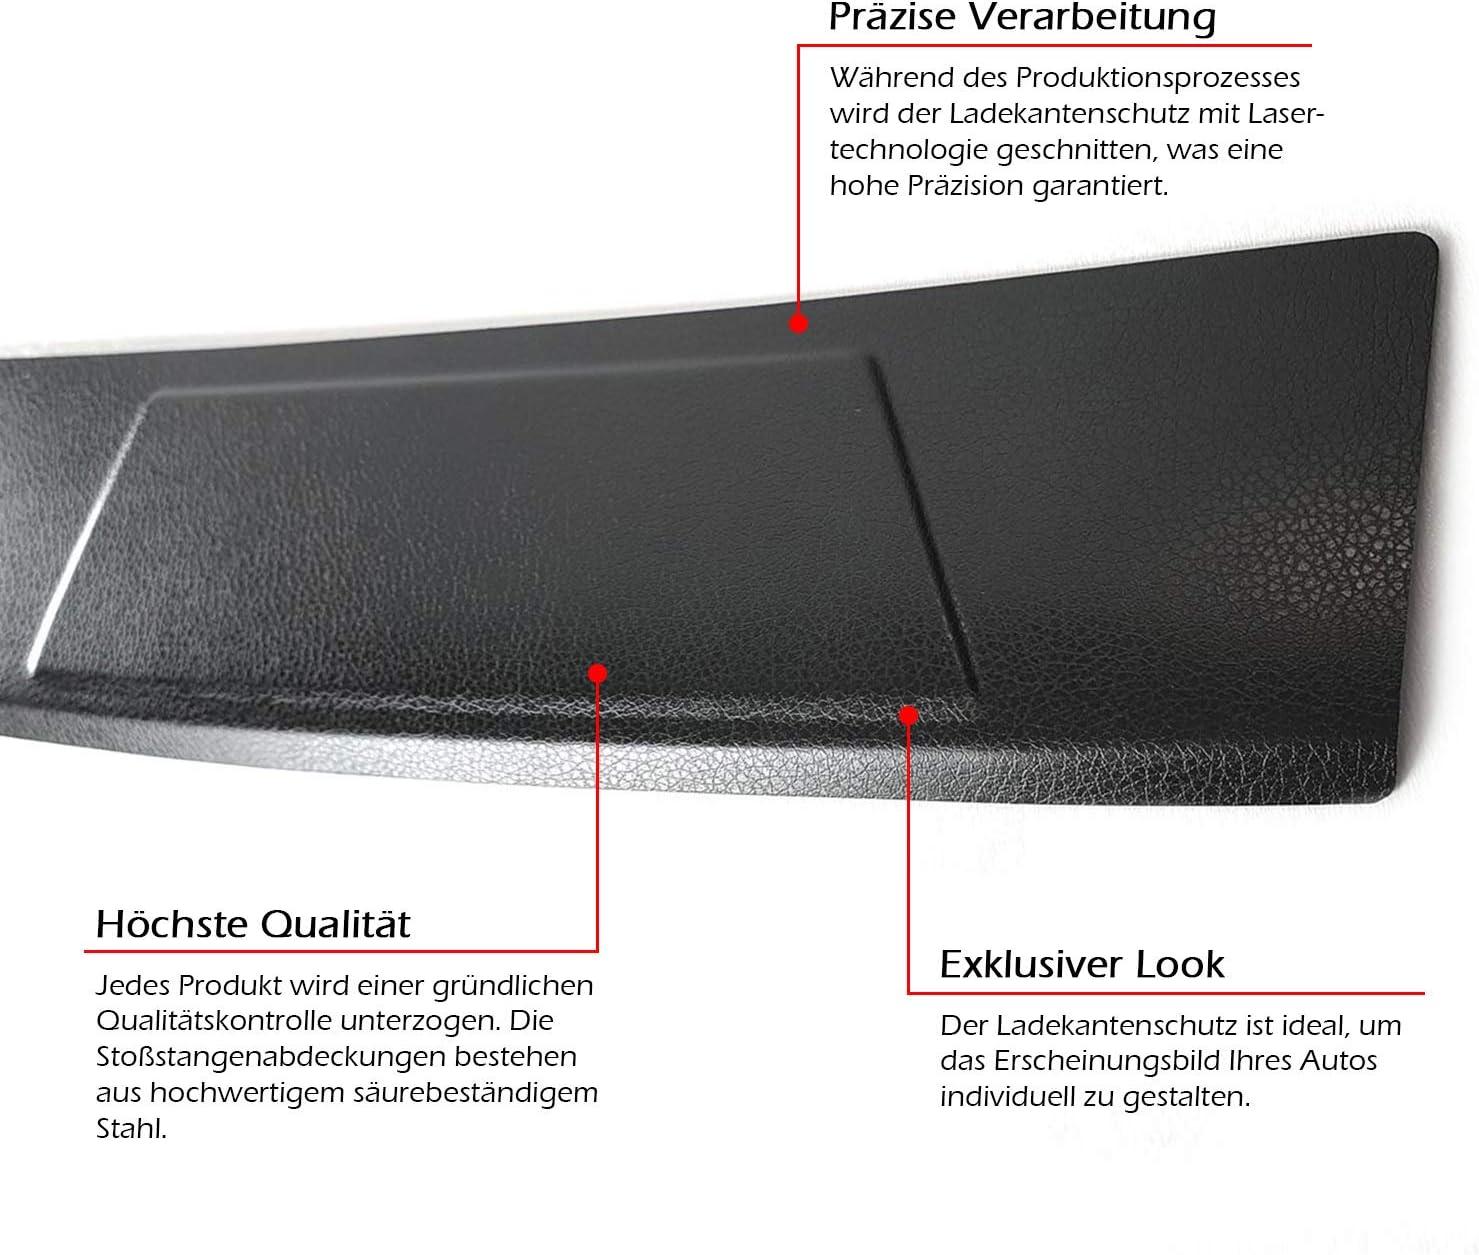 Edelstahl Ladekantenschutz Abkantung Selbstklebend Fahrzeugspezifisch Auto